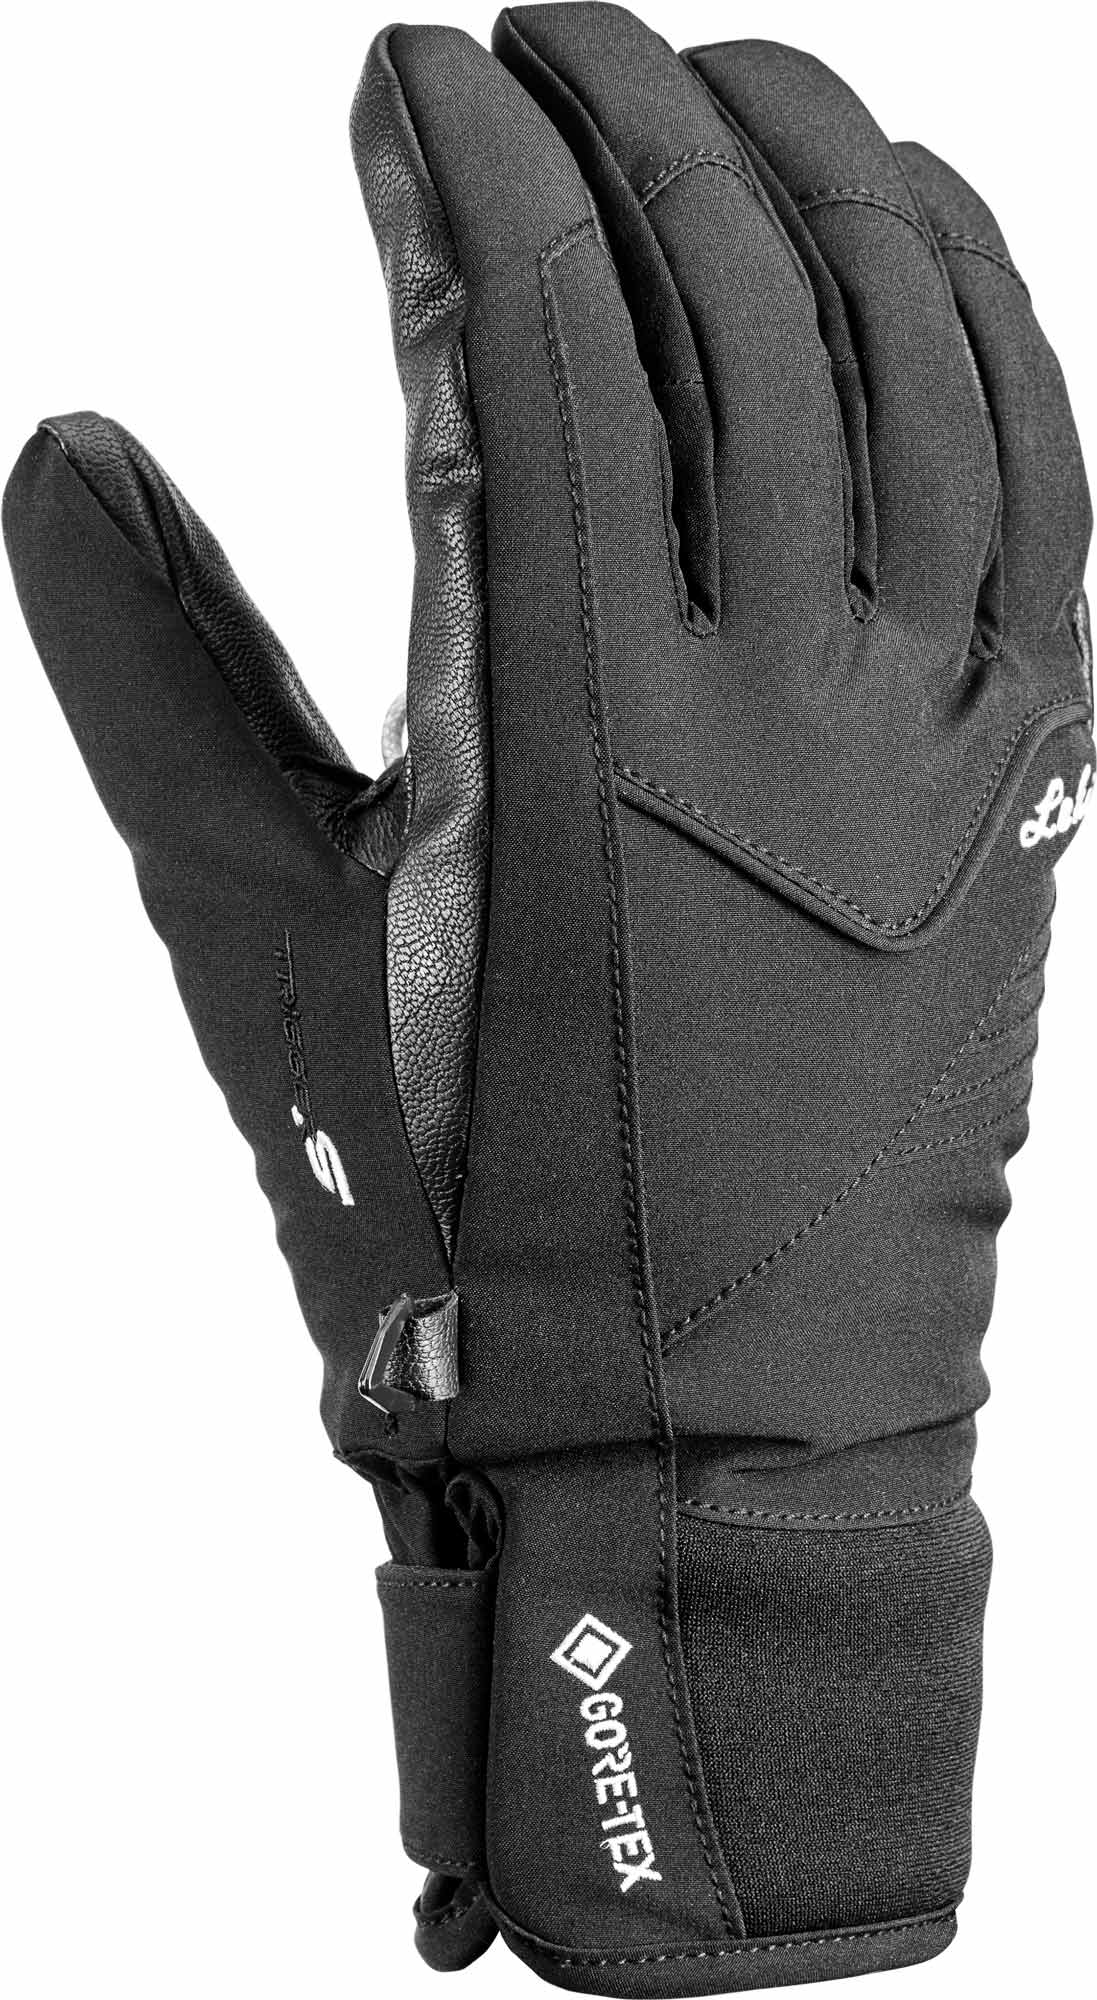 Leki Ergo S GTX Lady - Goretex Damenhandschuhe mit Trigger S